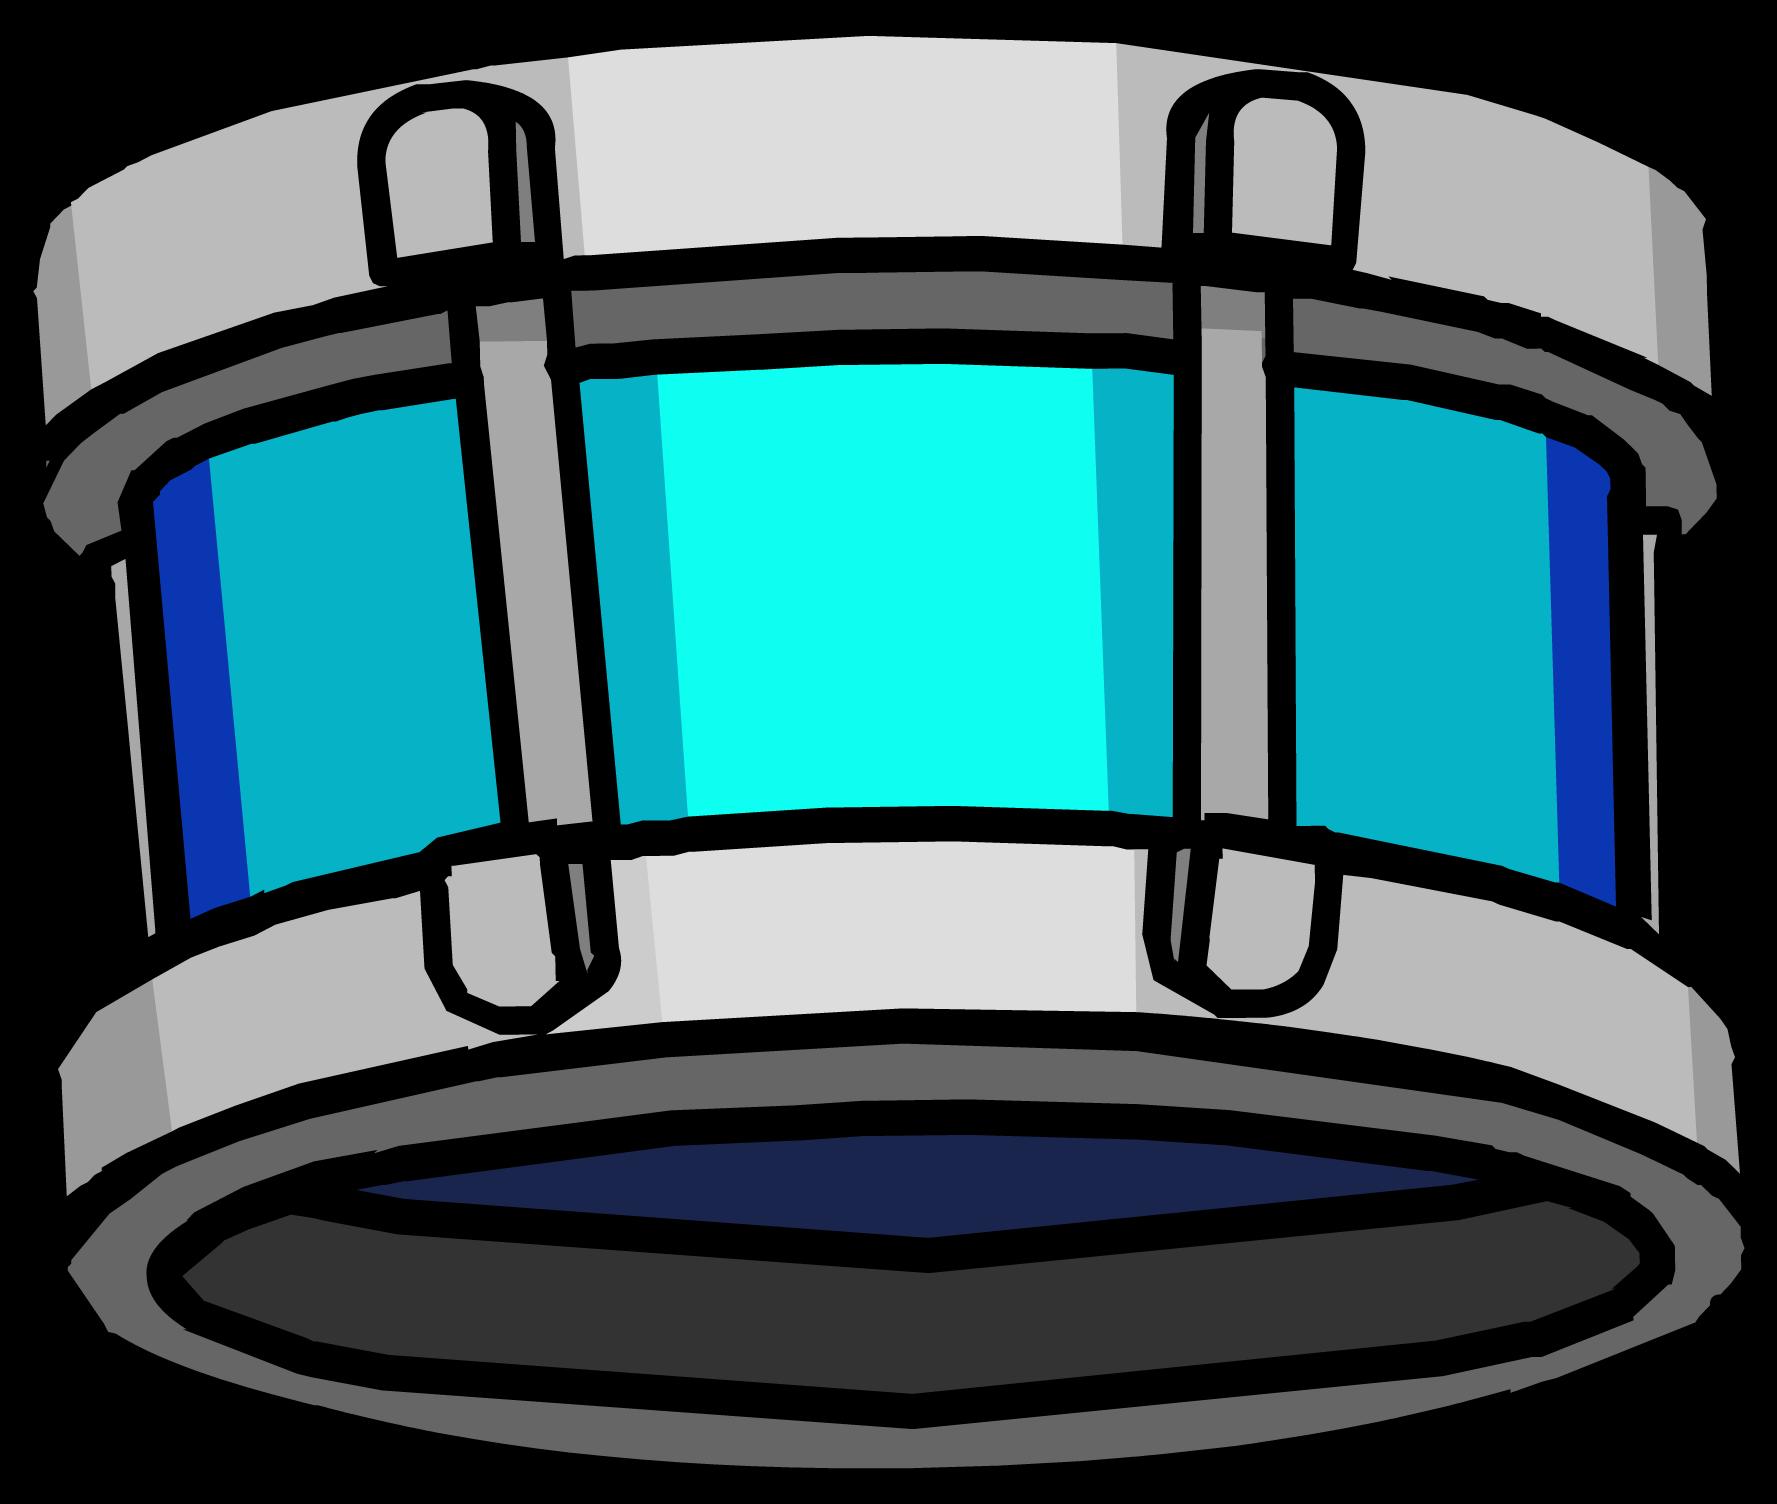 Club penguin wiki fandom. Drum clipart drum roll